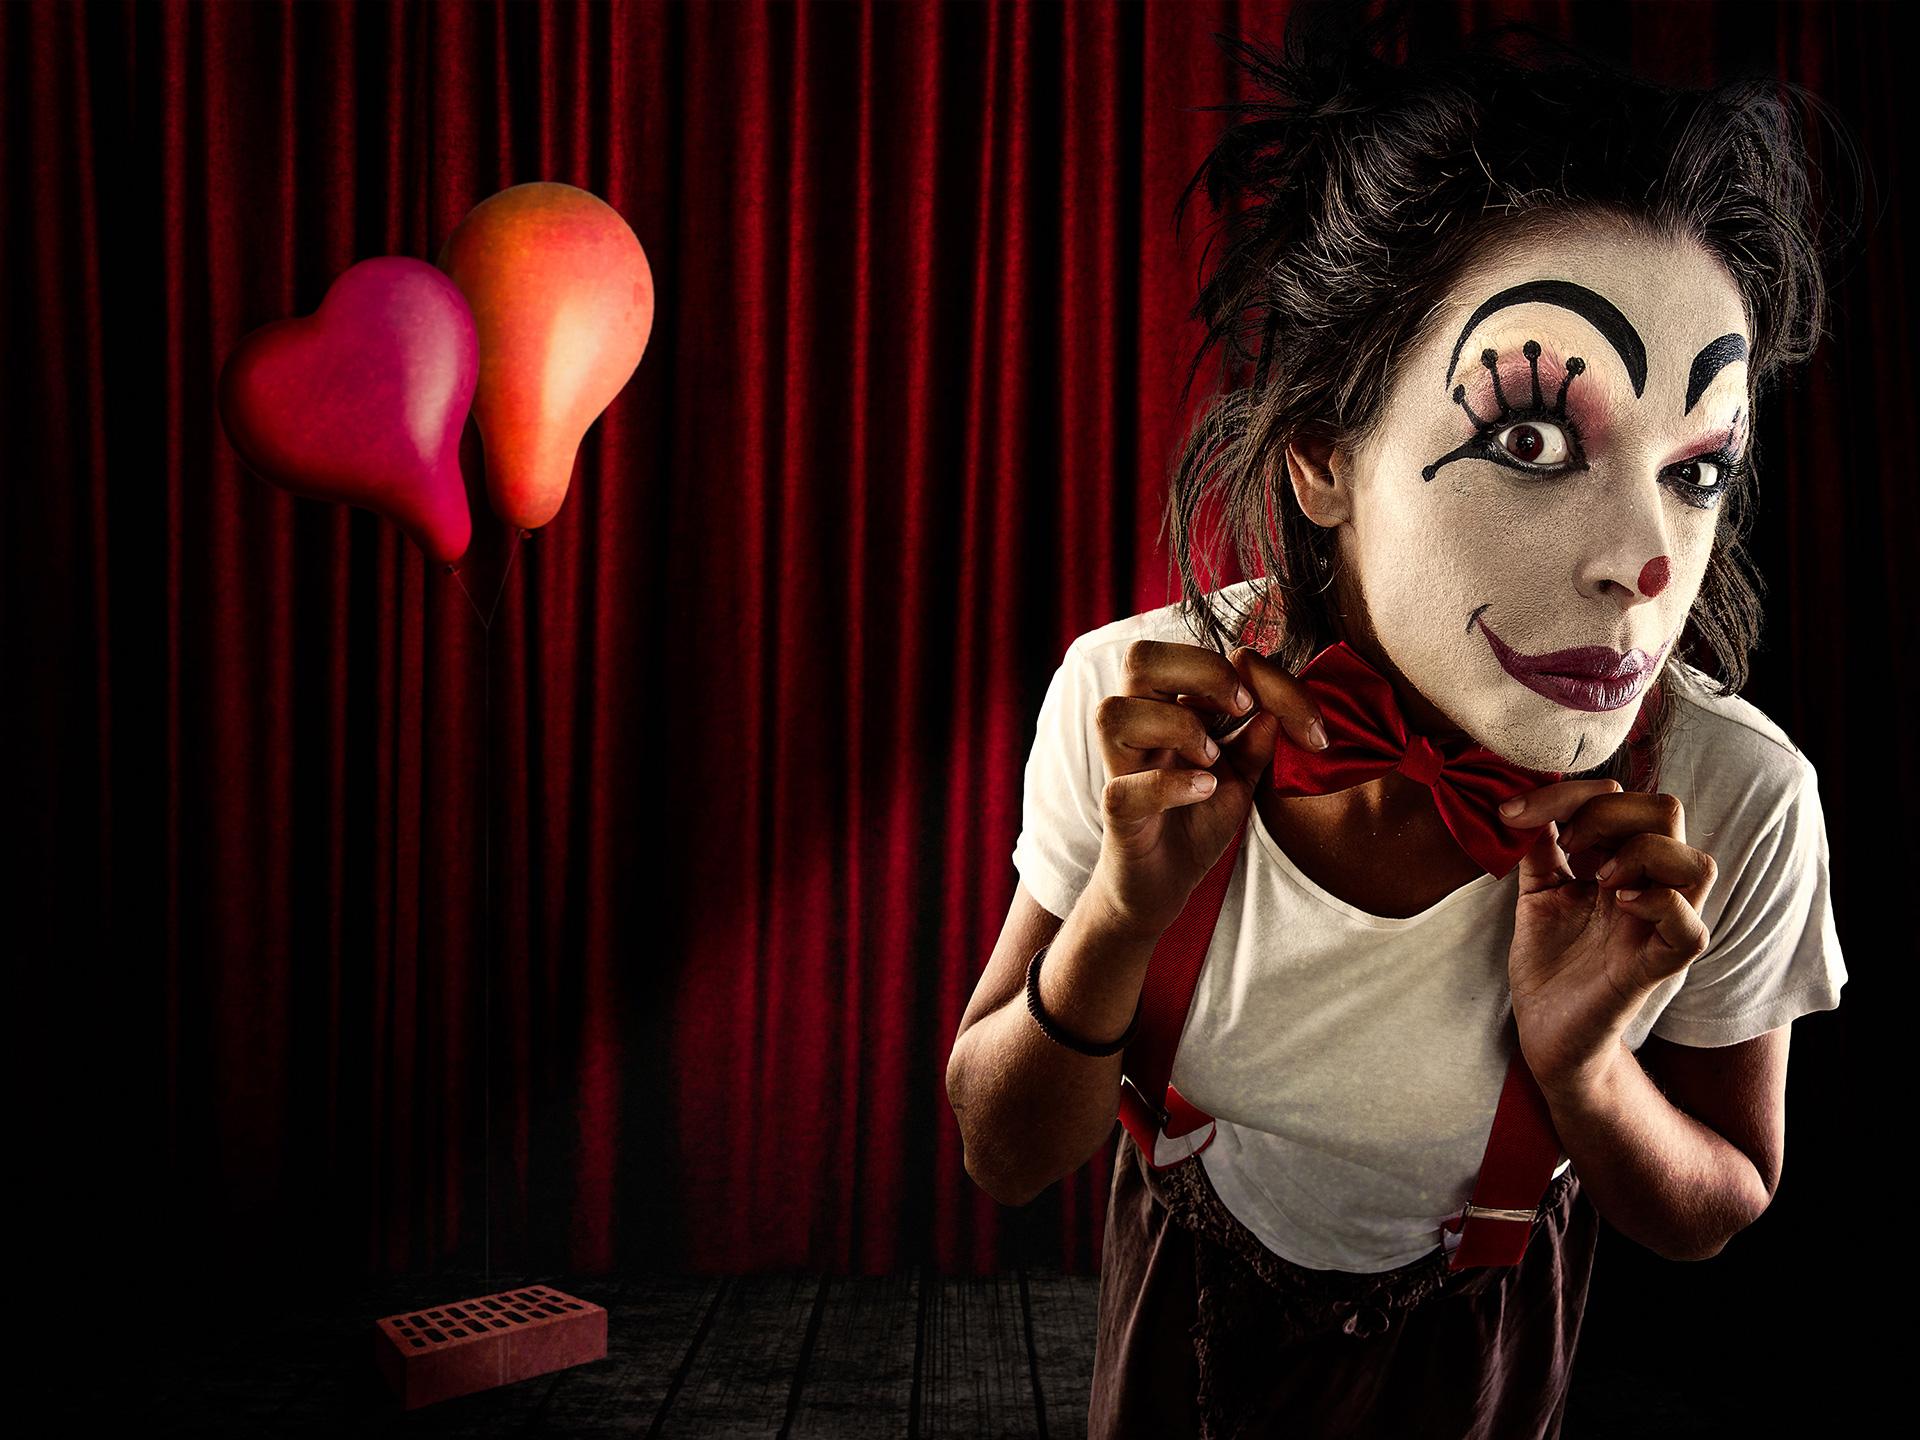 Creepy Cloun Stage, Theatre, red curtain, orange baloon